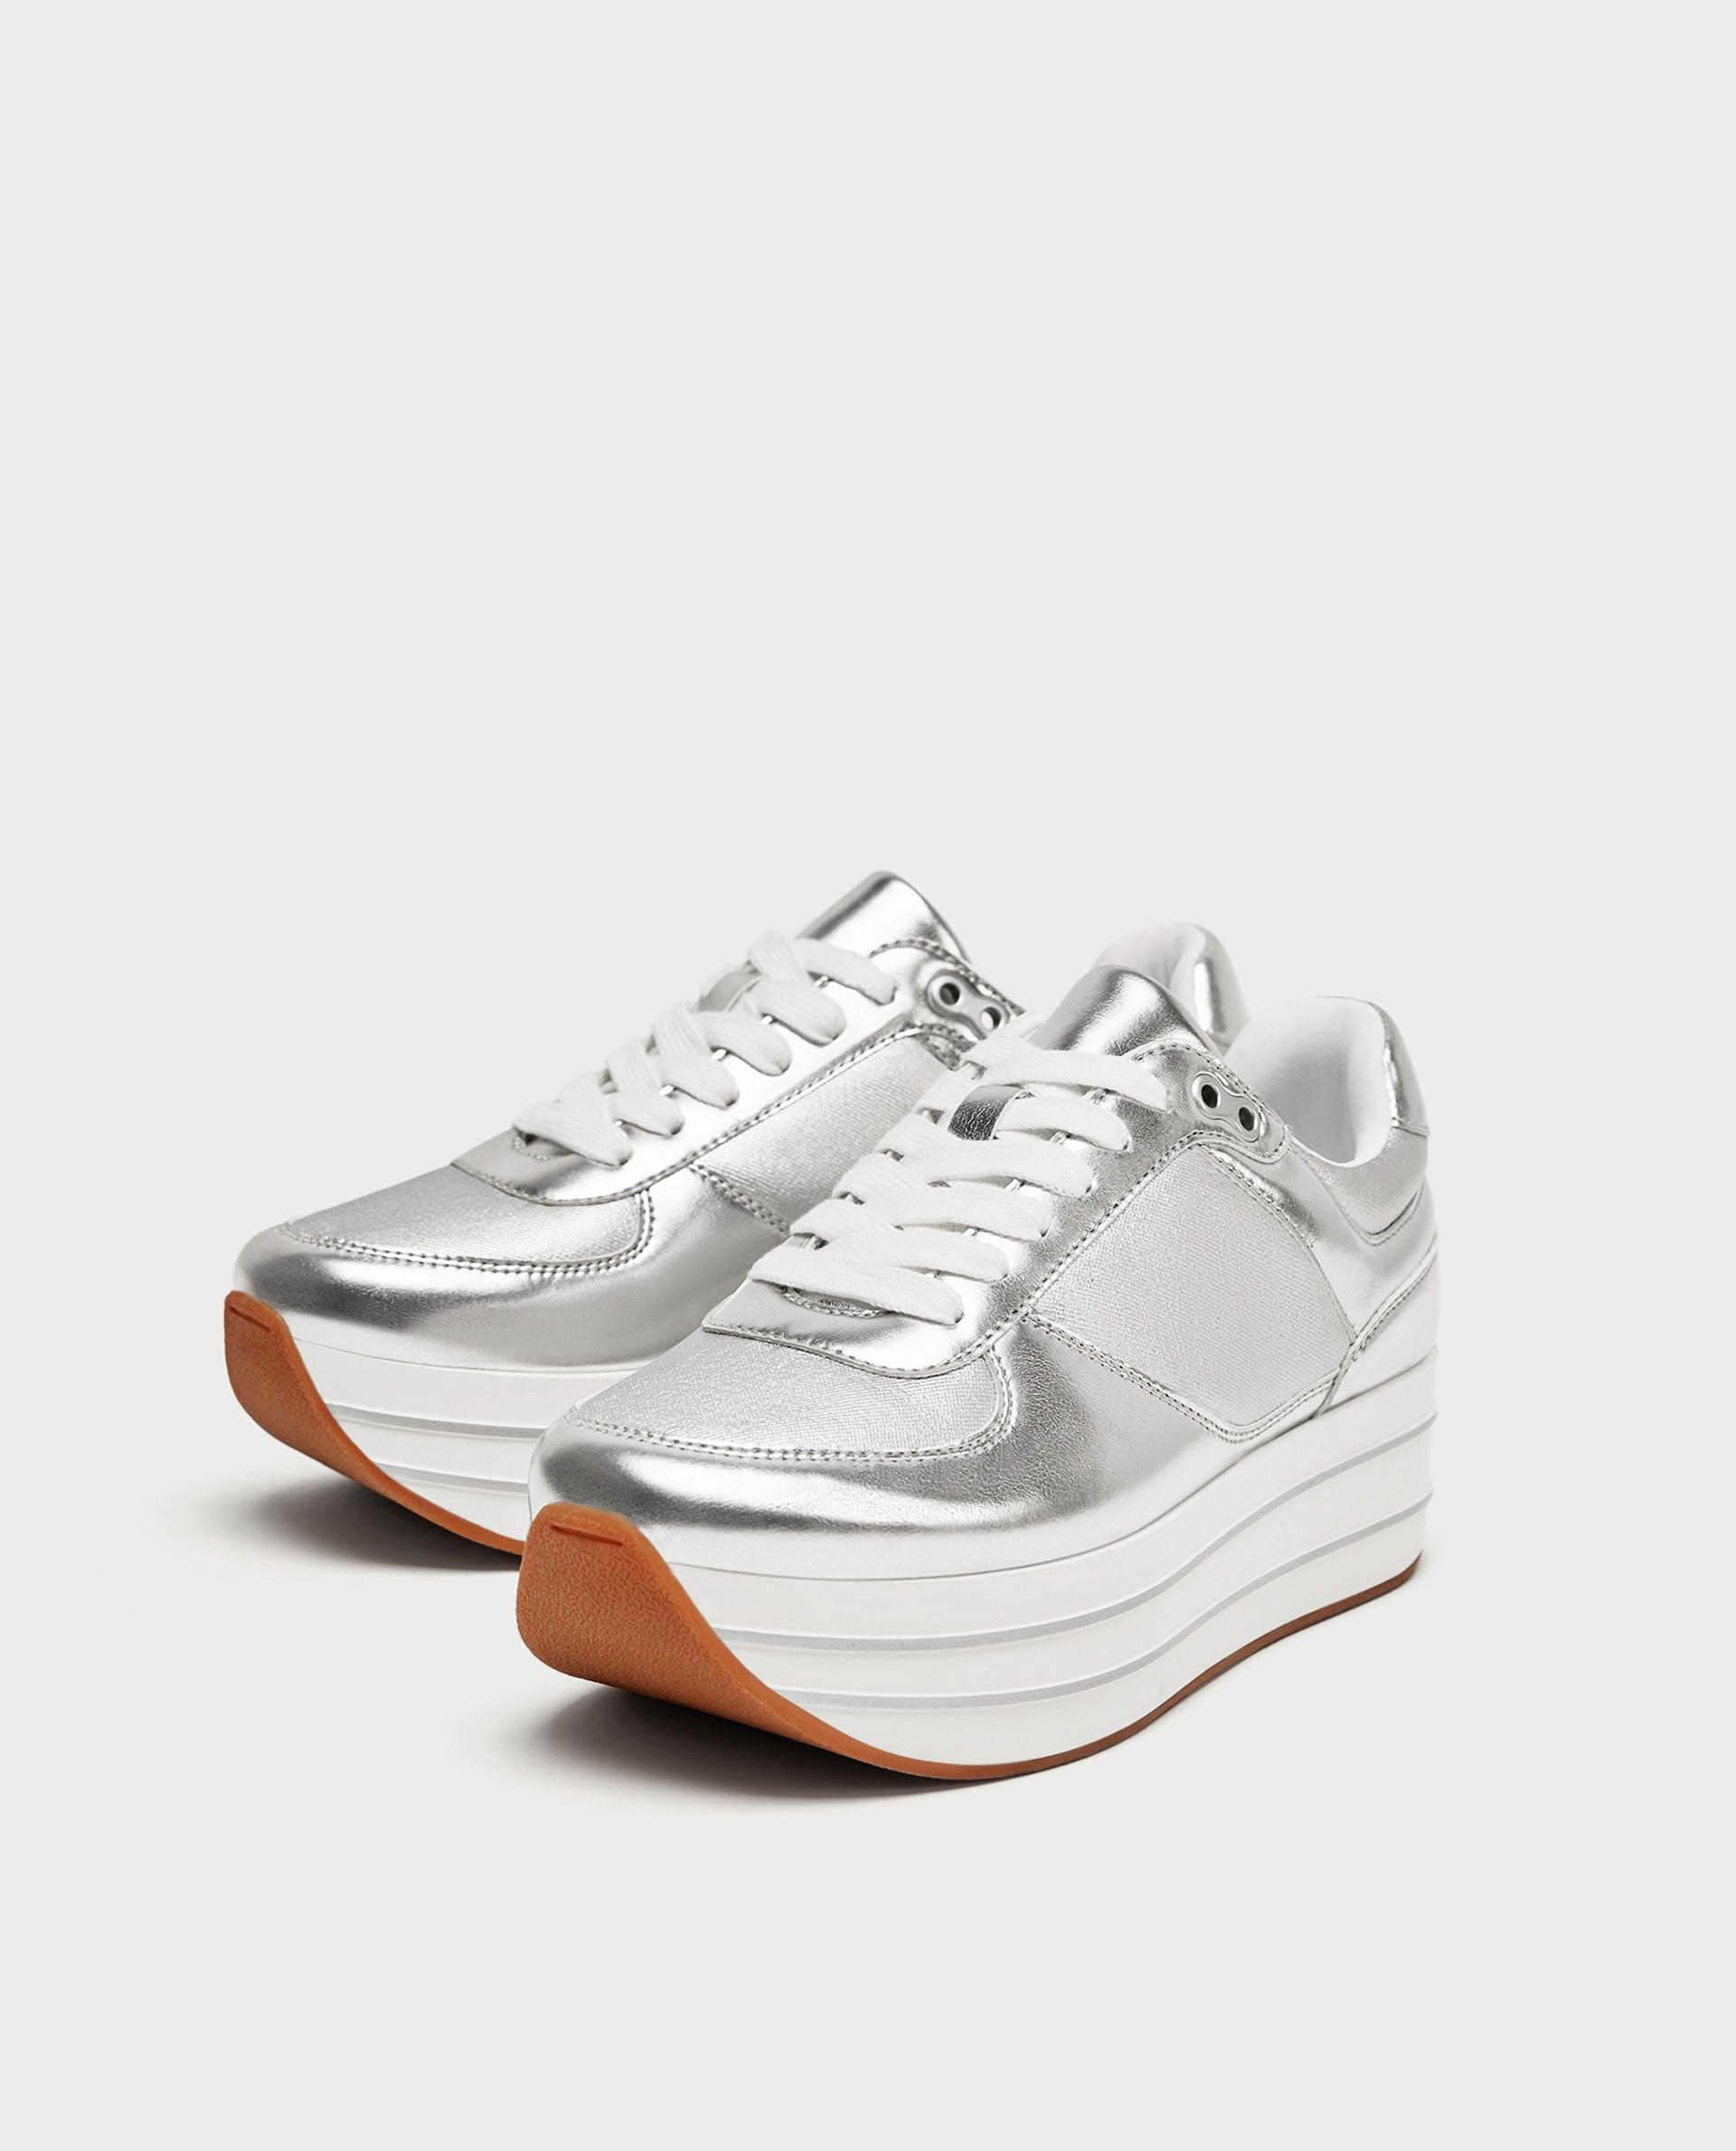 Zara Silver Platform Sneakers   Gigi